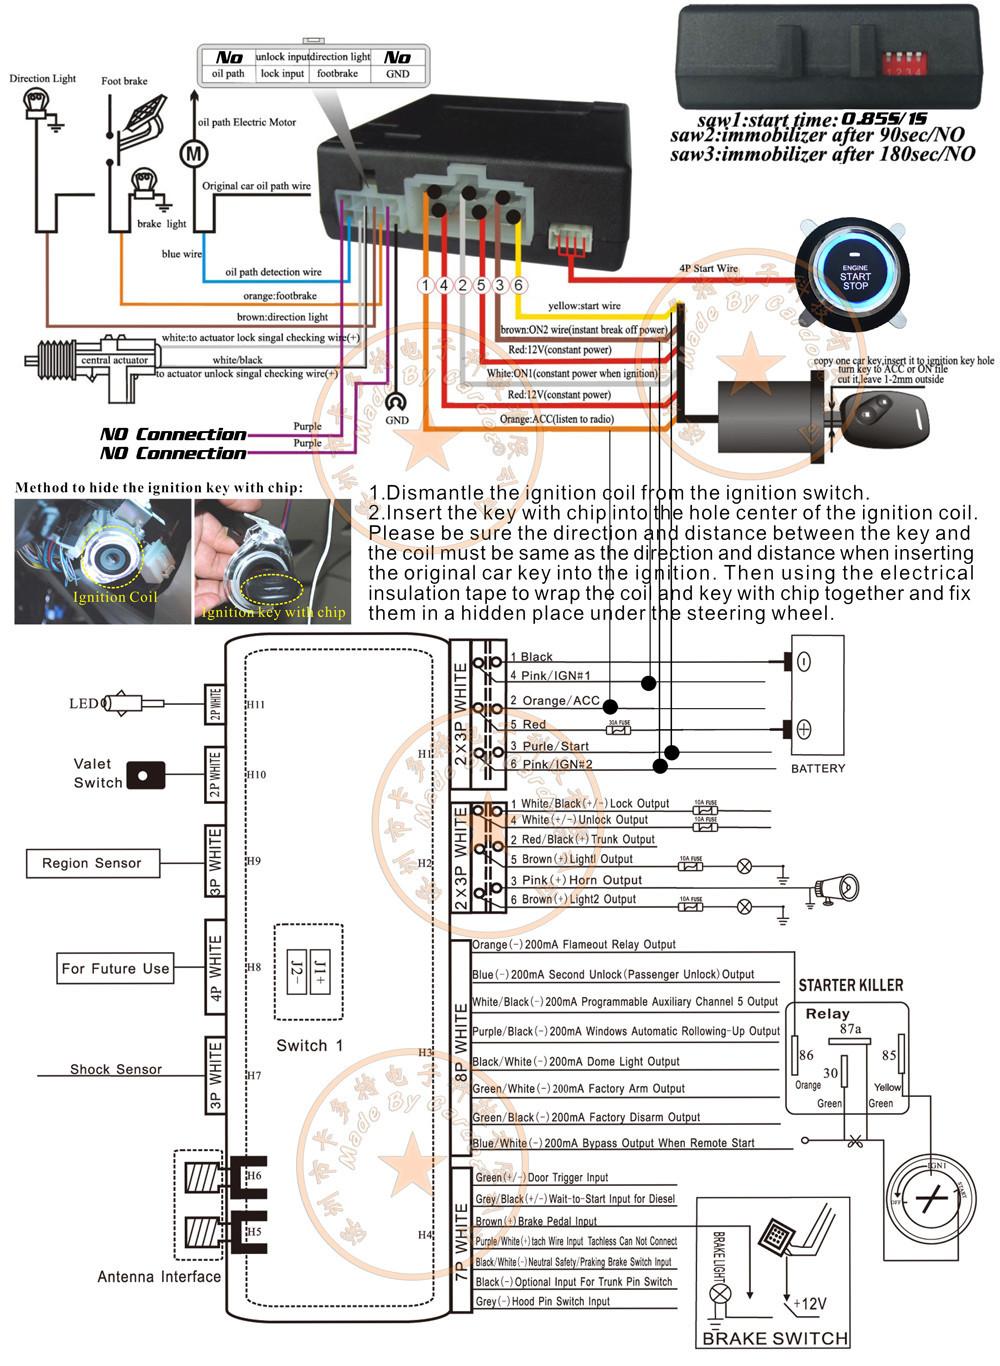 Remote Starter Keyless Entry Wiring Diagram Wiring Diagram